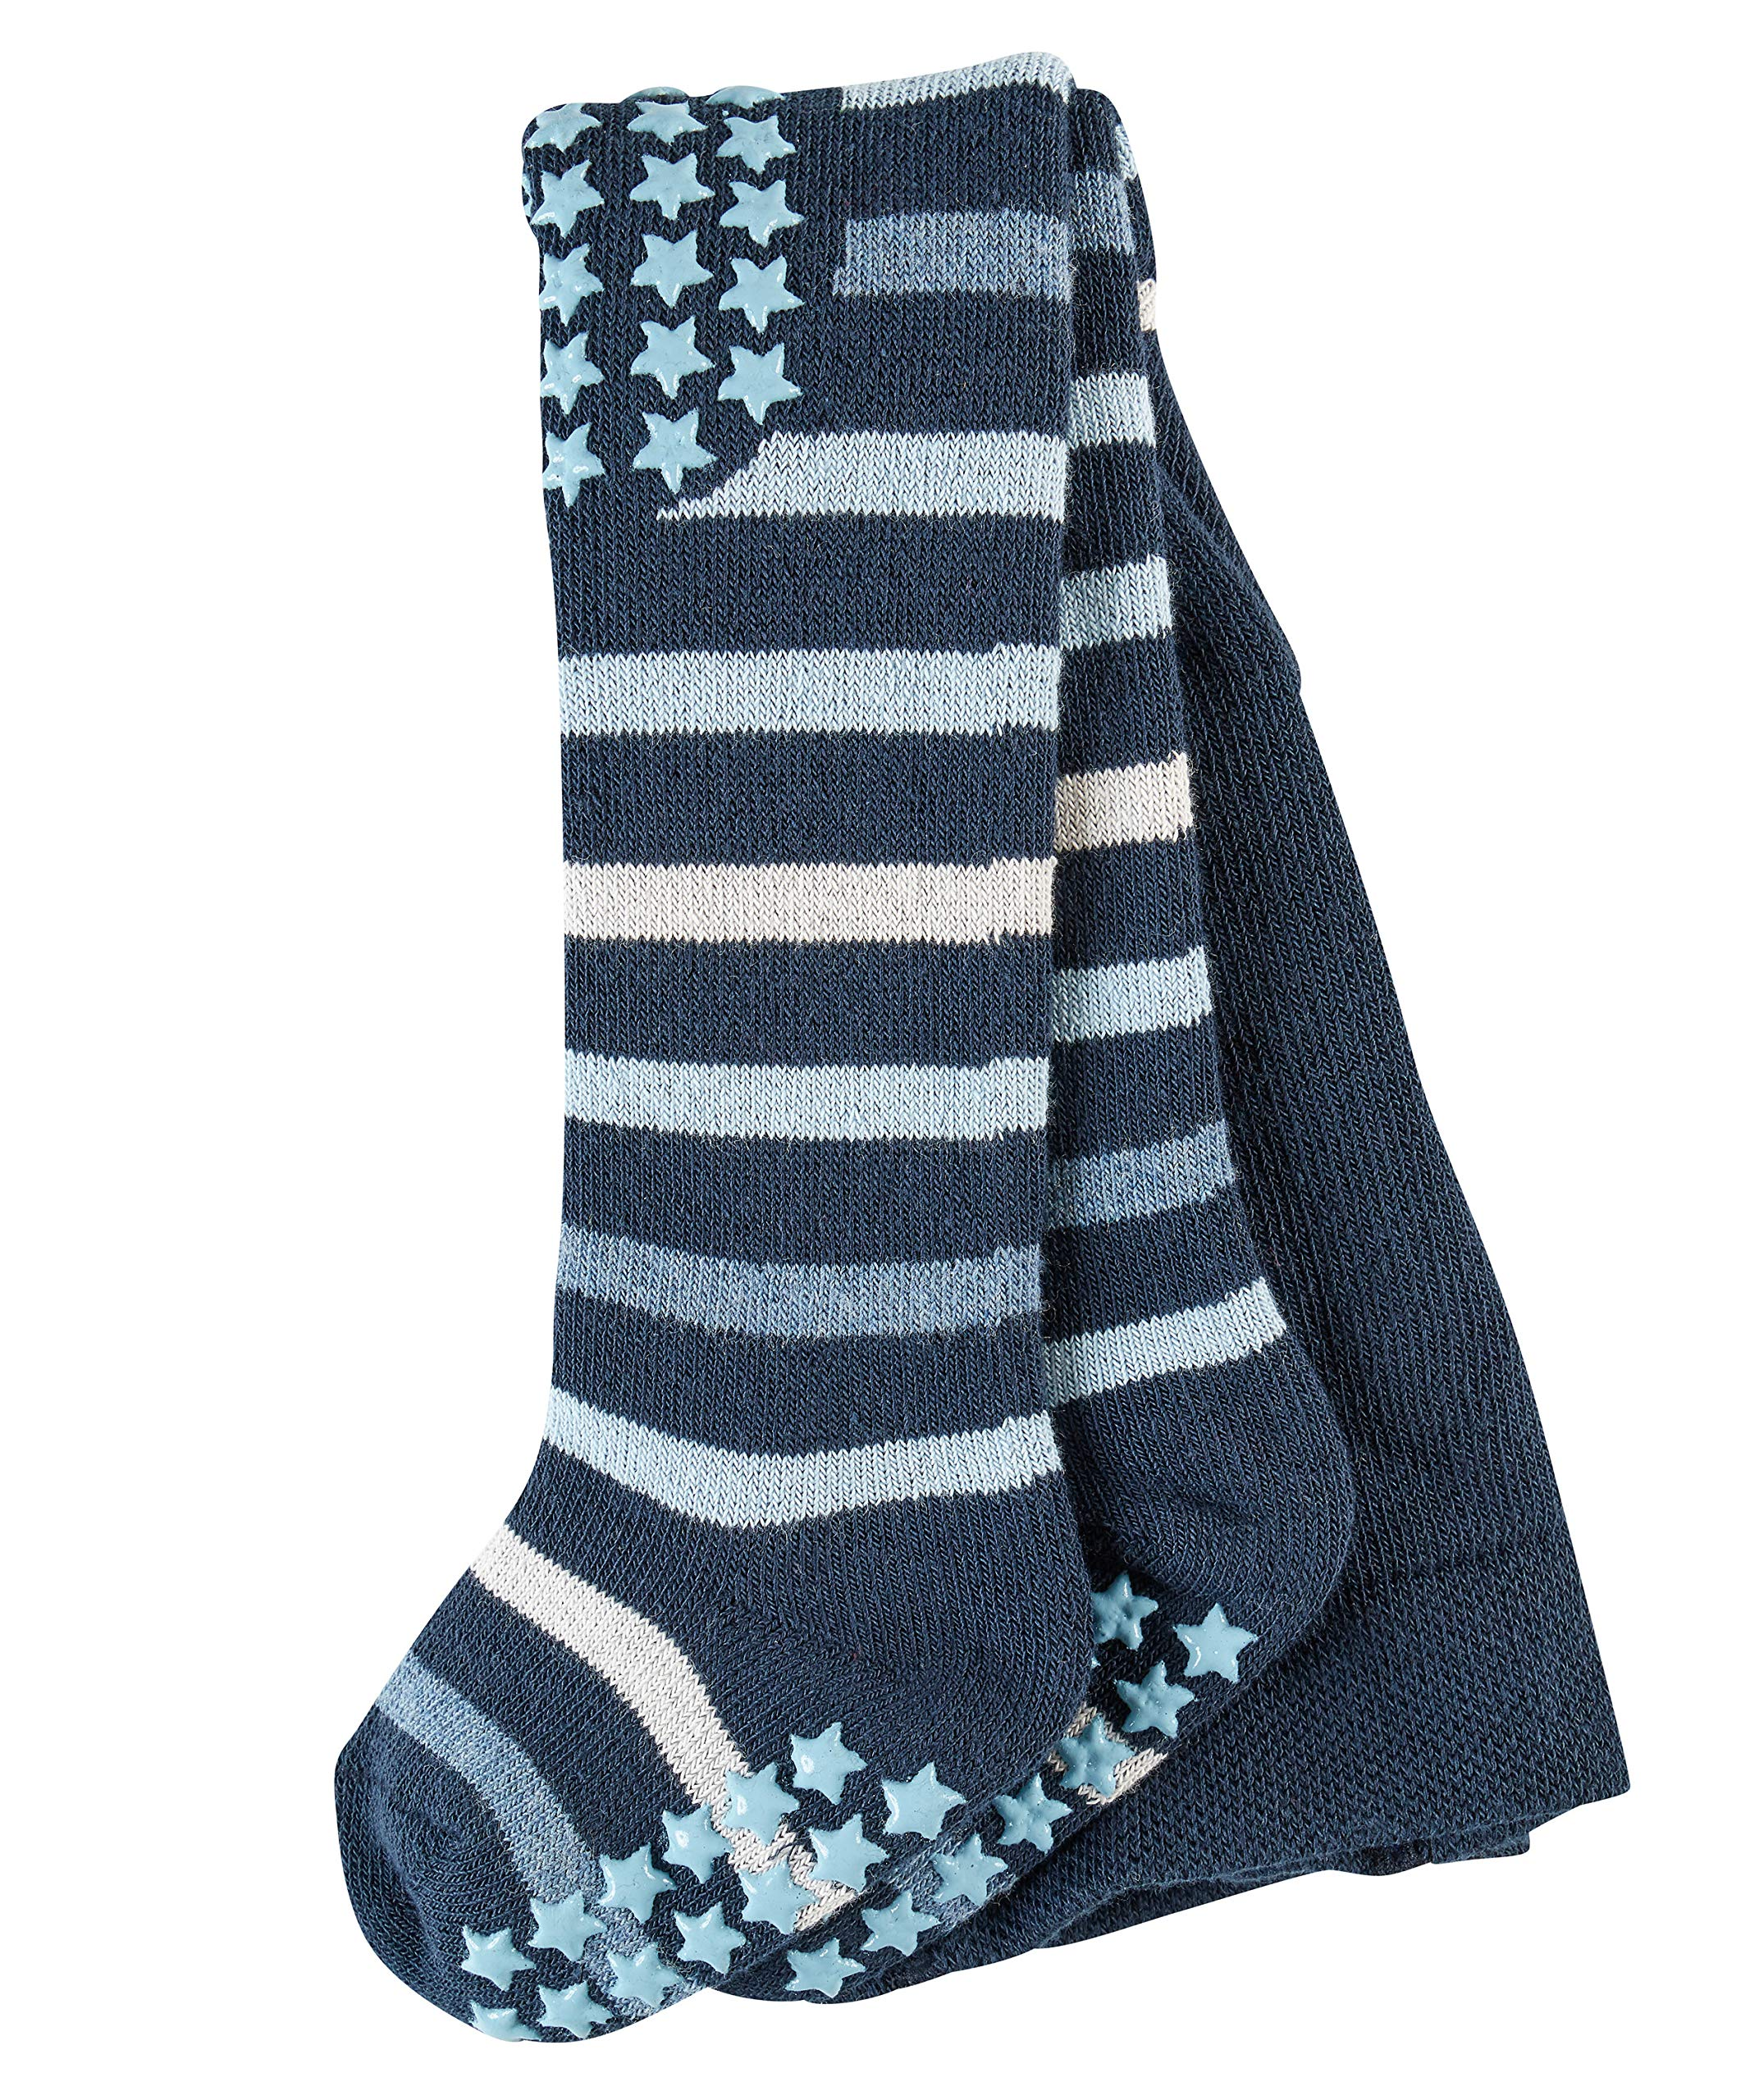 Falke Multi Stripe Calcetines para Bebés 1